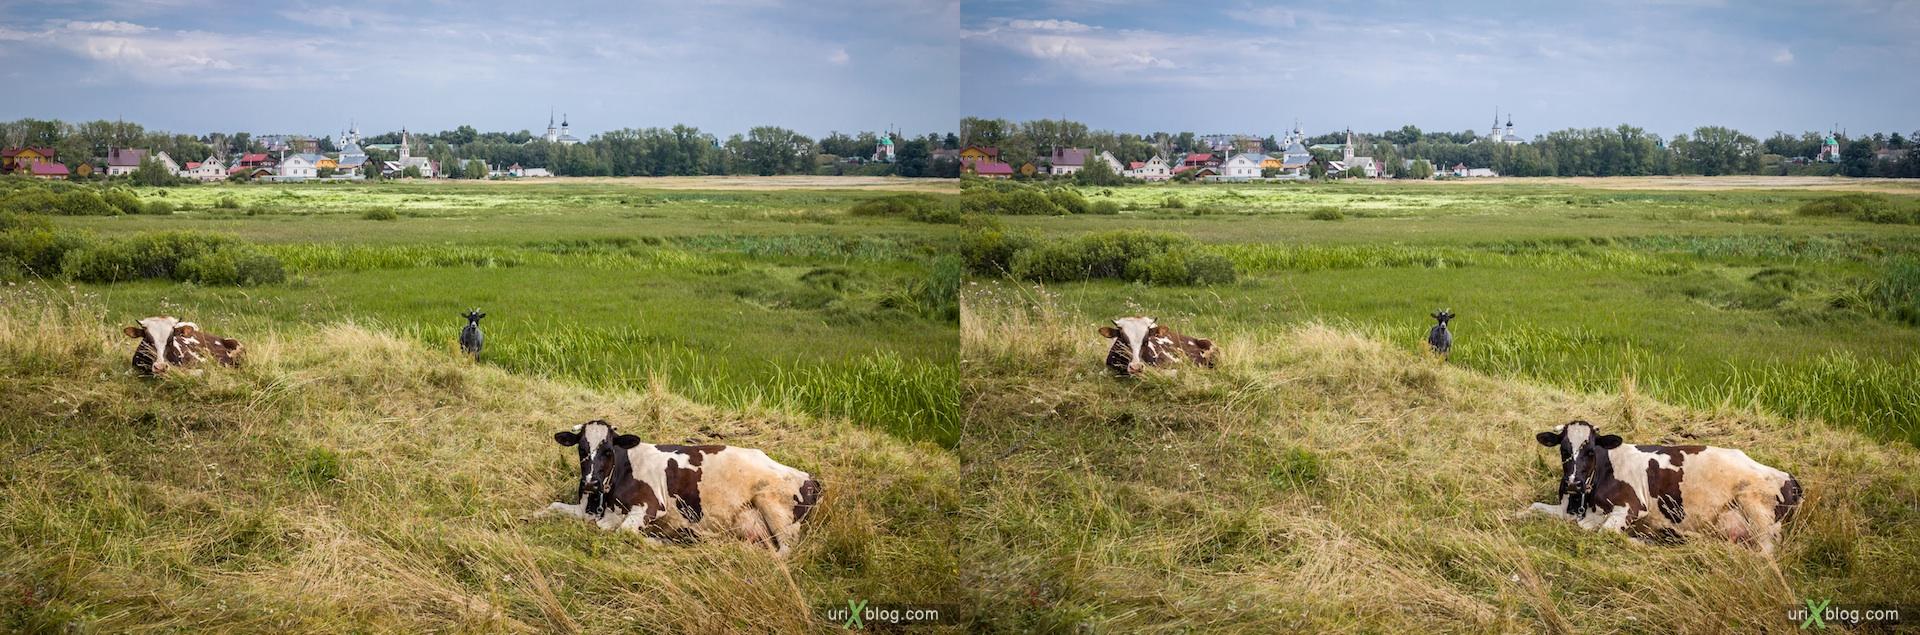 2012 Russia Suzdal Cows stereo 3d